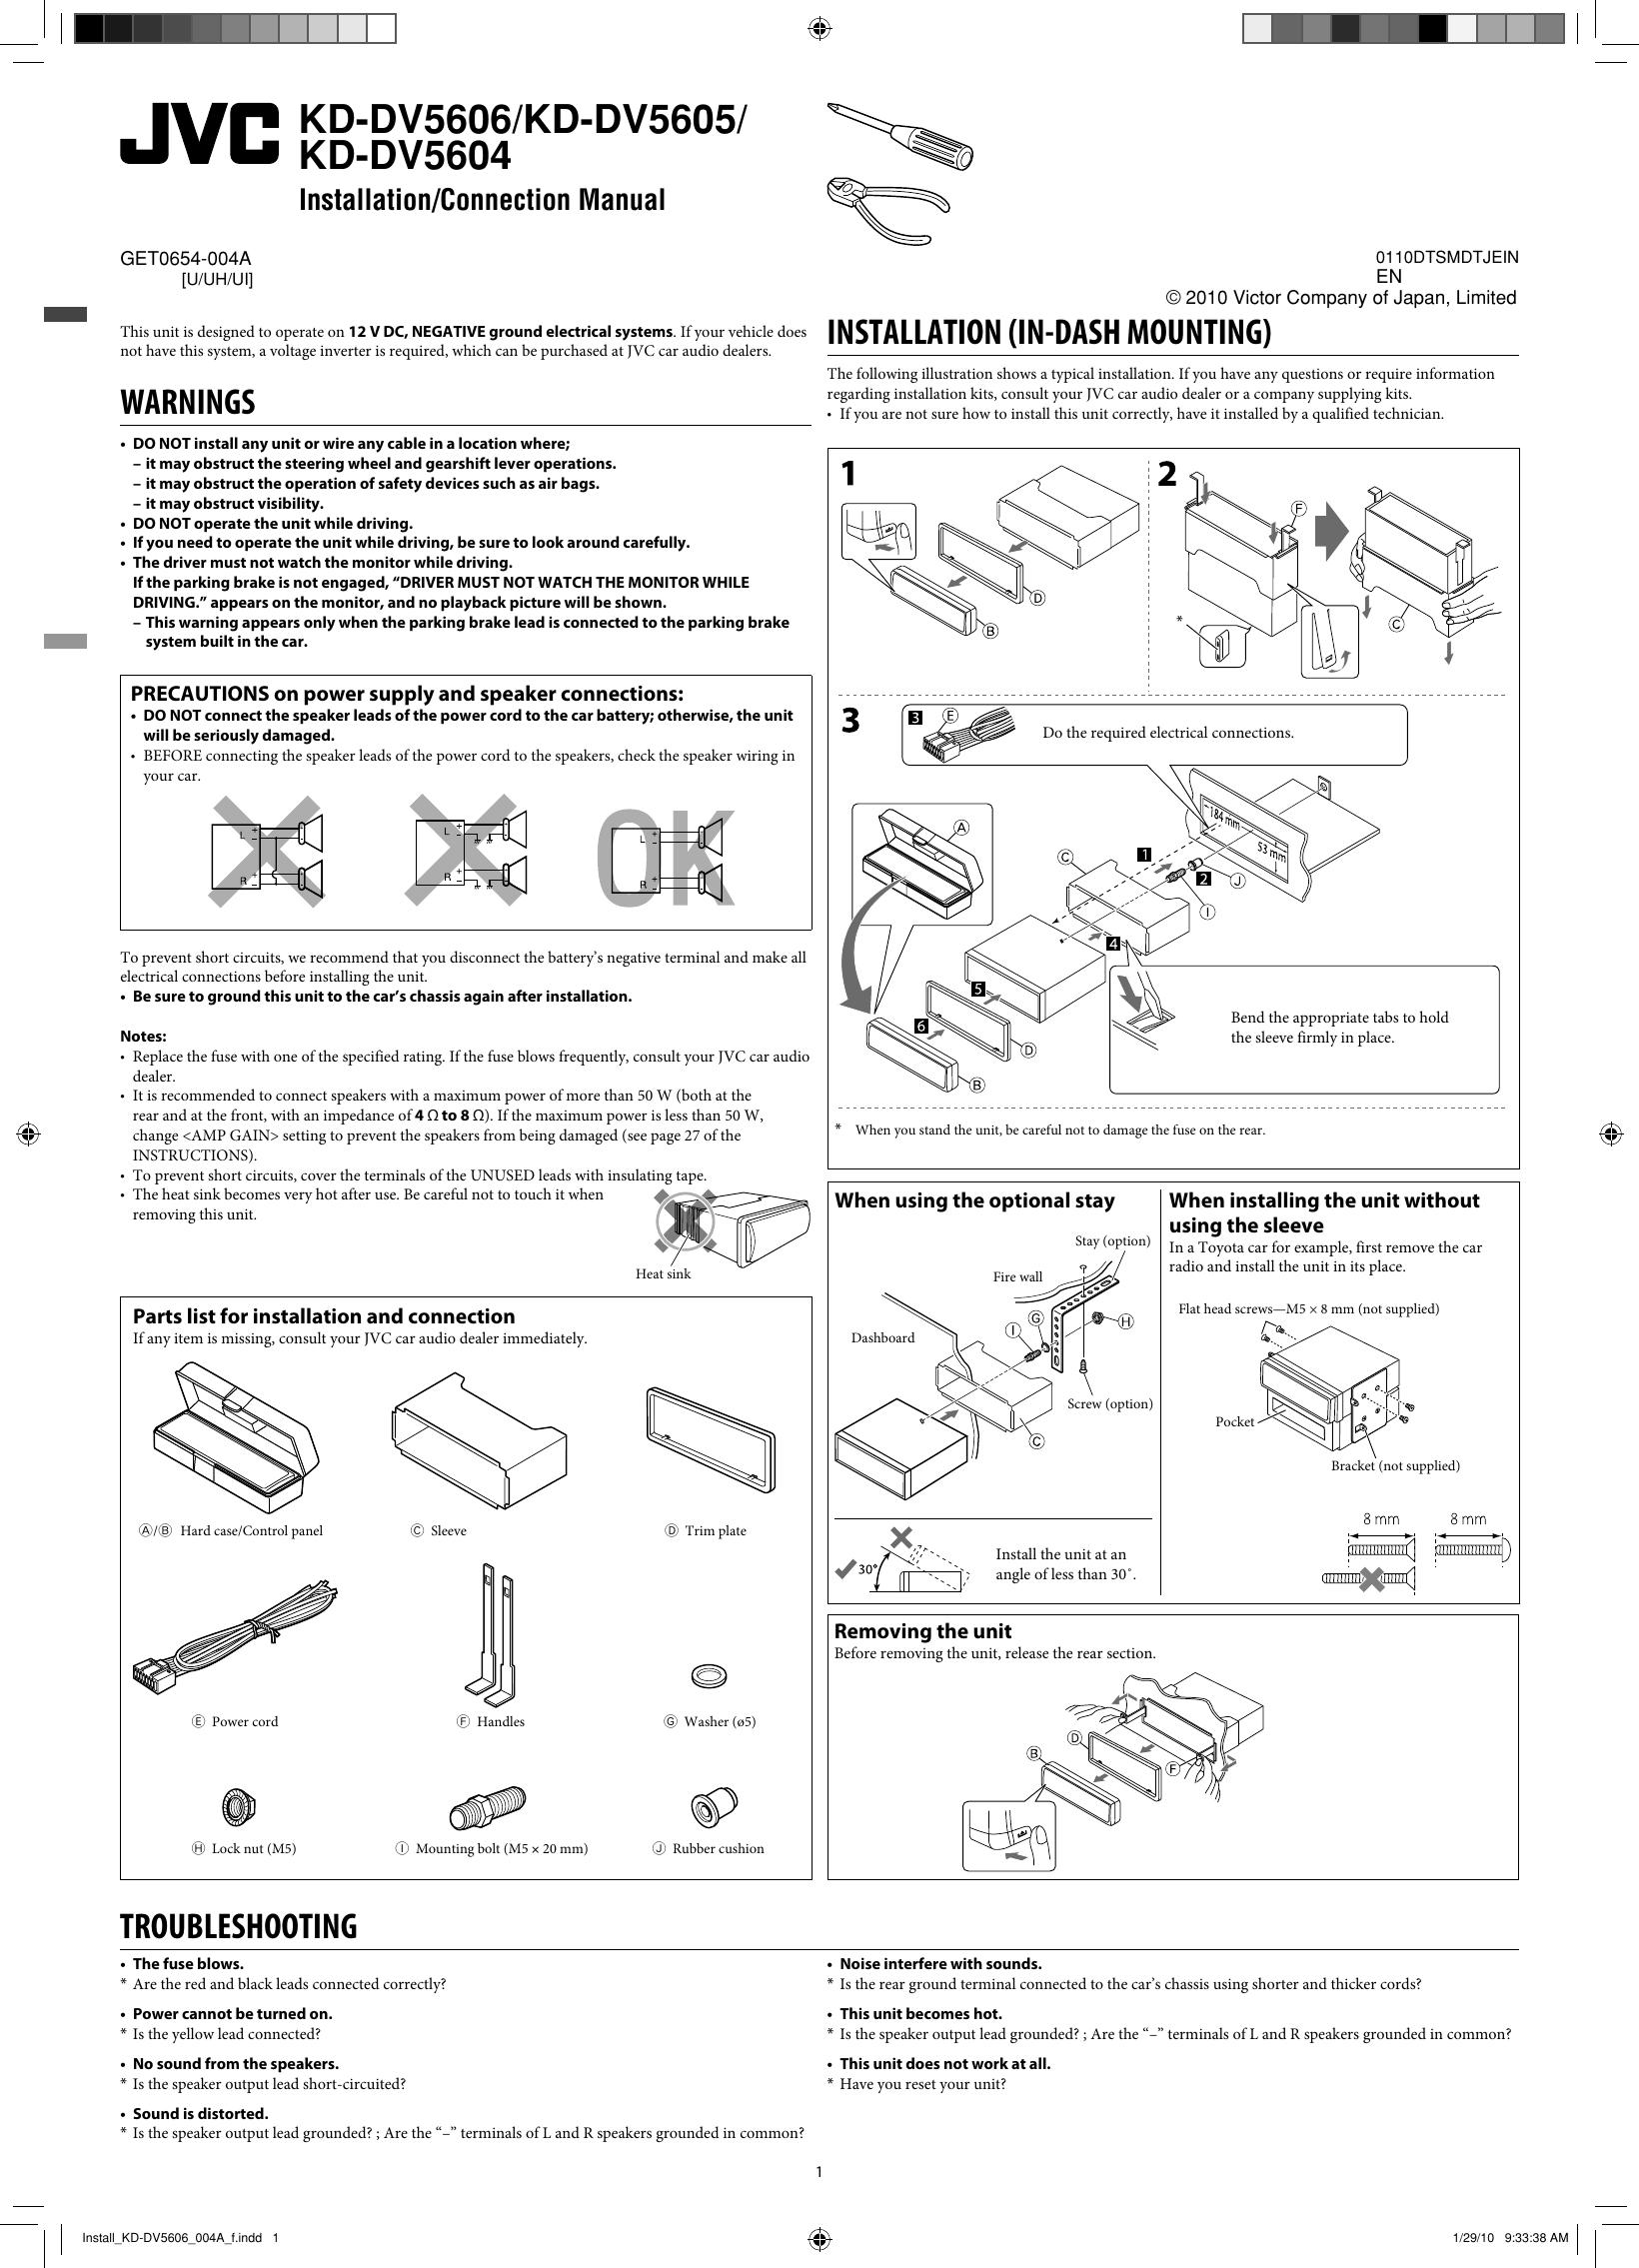 Jvc Kd Dv5605uh Install Kd Dv5606 004a F User Manual Dv5605uh Dv5606uh Get0654 004a